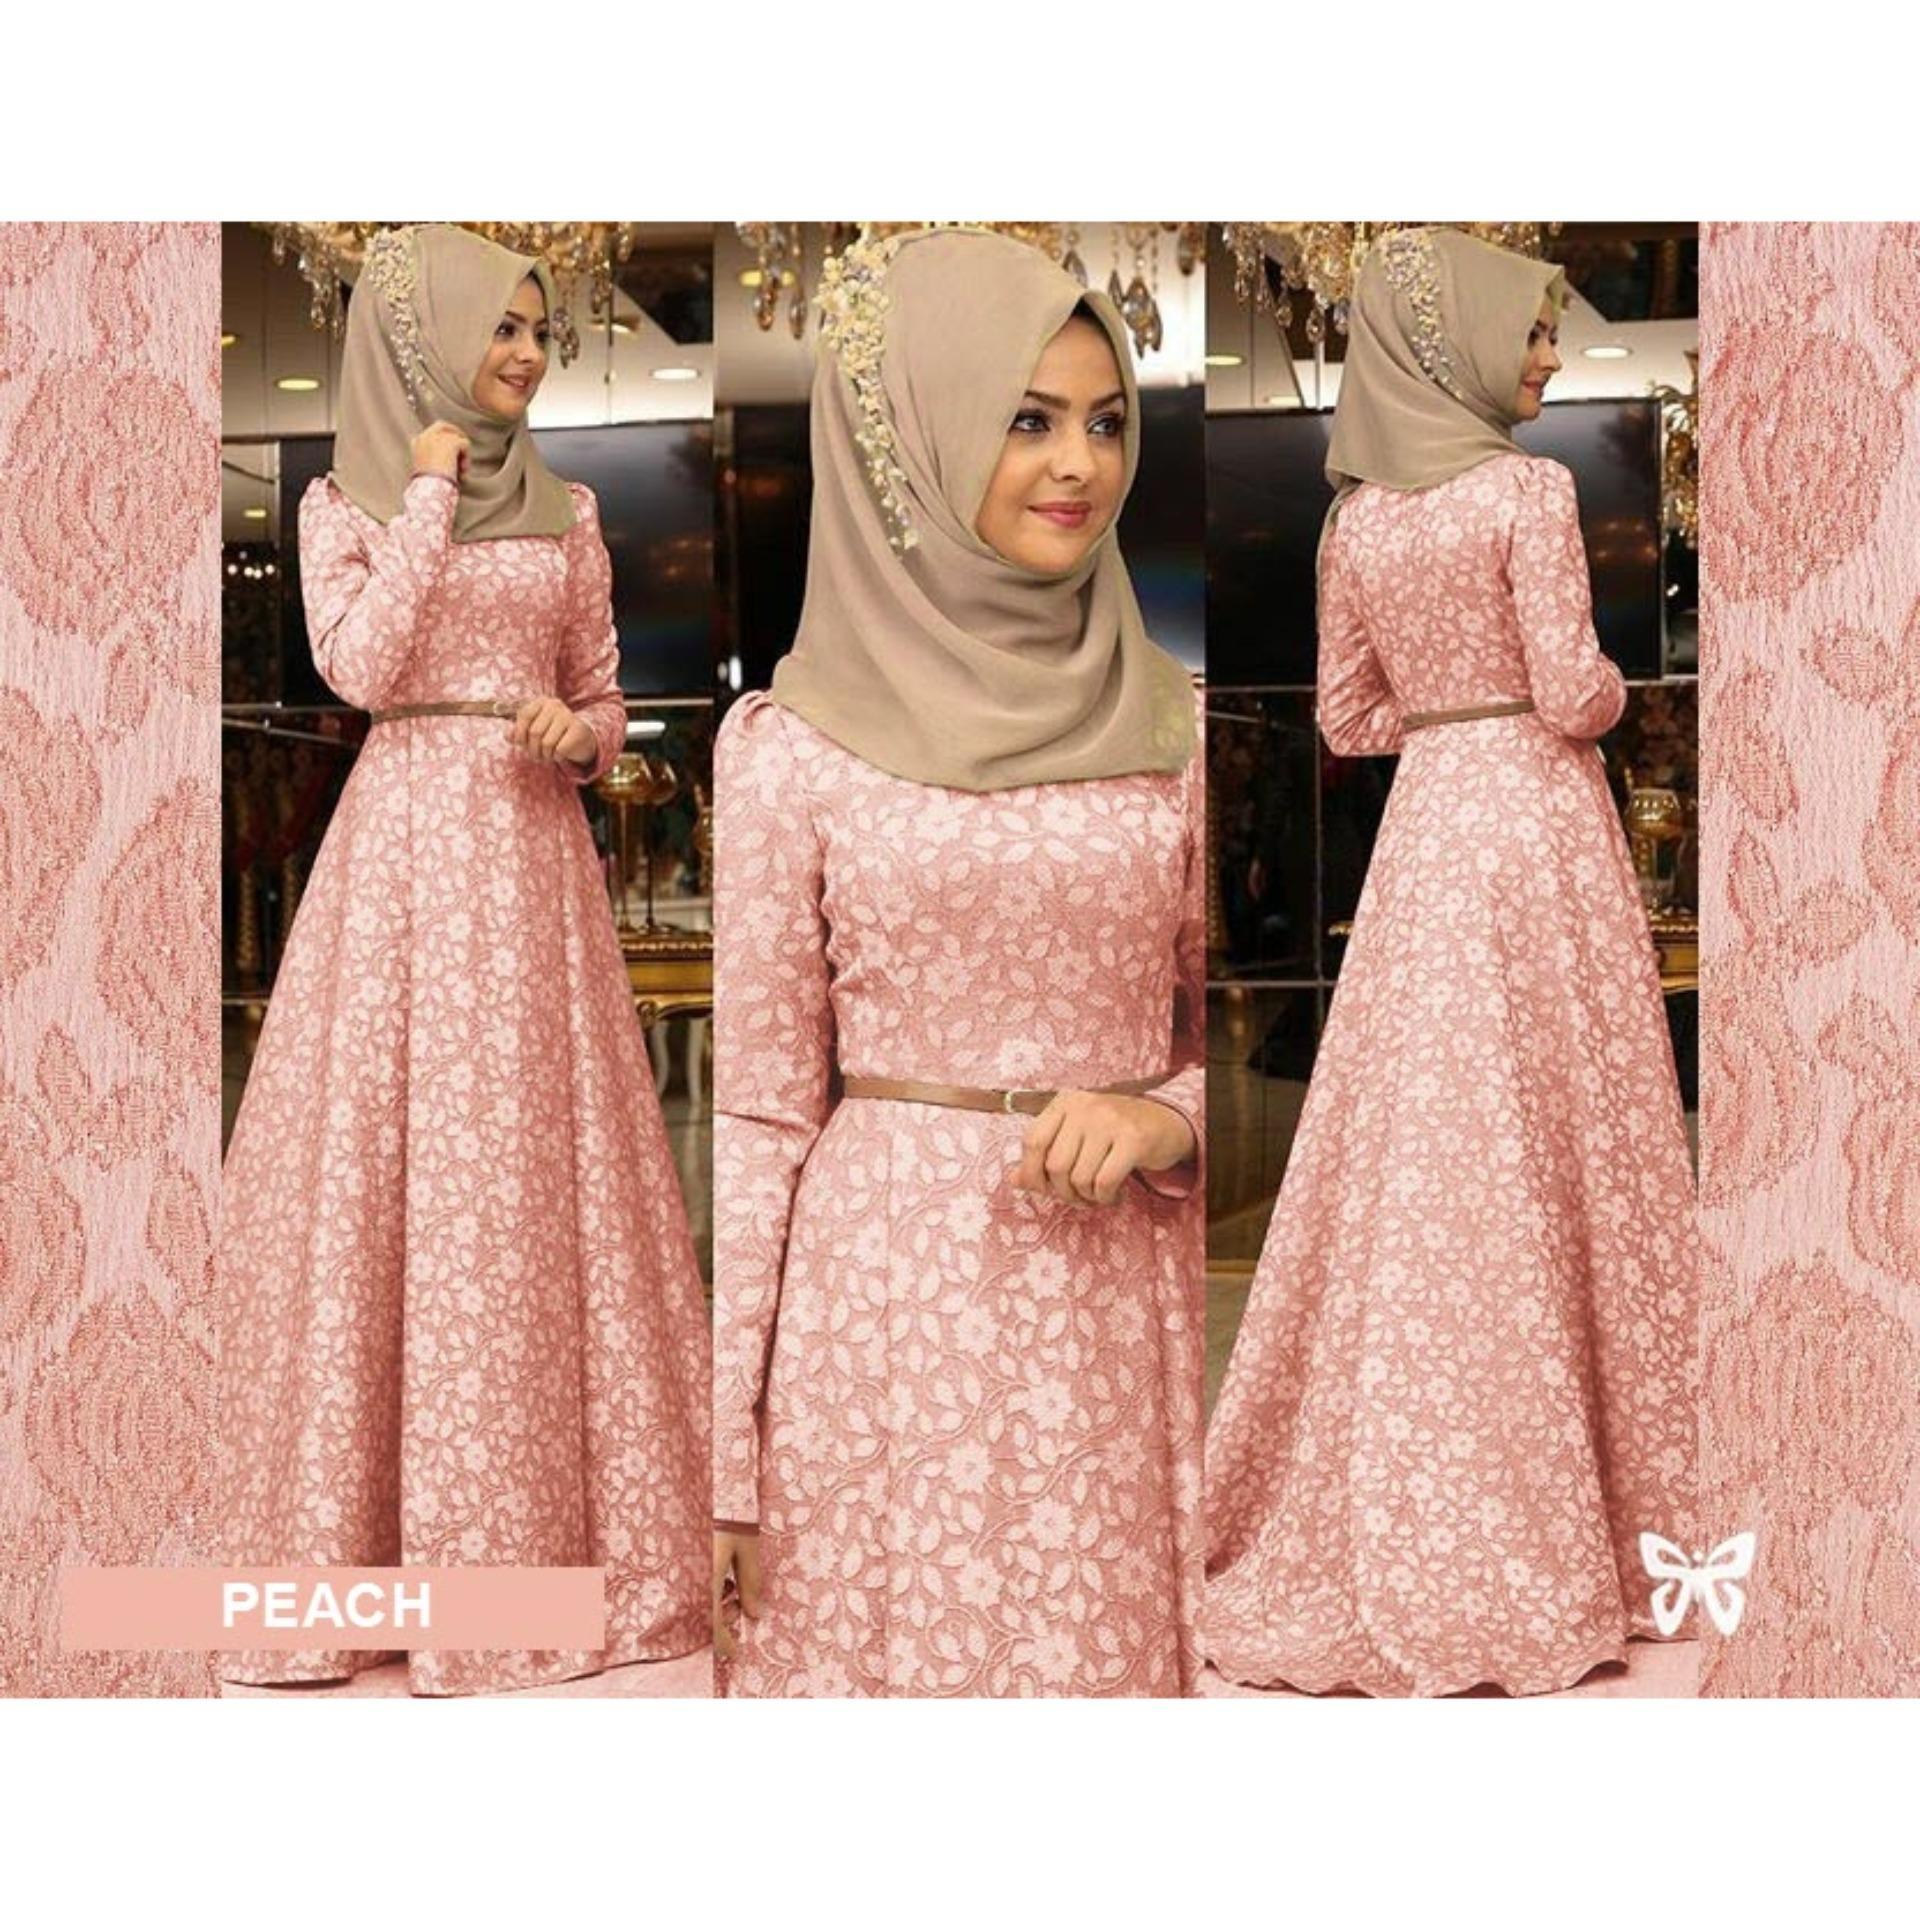 Maxi Dress Lengan Panjang MSR087 Gamis Syari Gaun Pesta Muslimah Baju Muslim Wanita